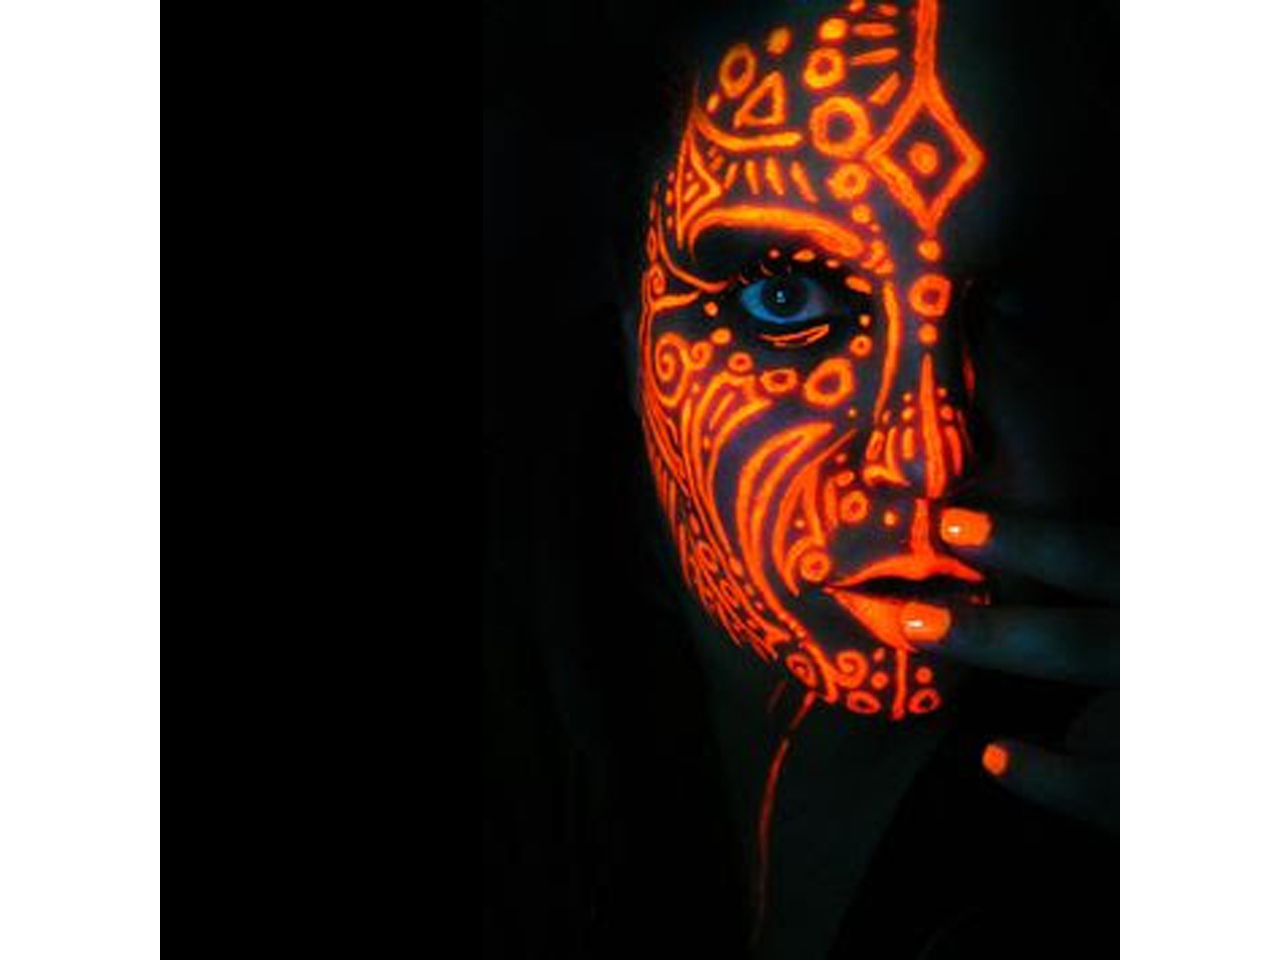 Stargazer Mini Night Glow in the Dark Face and Body Paint